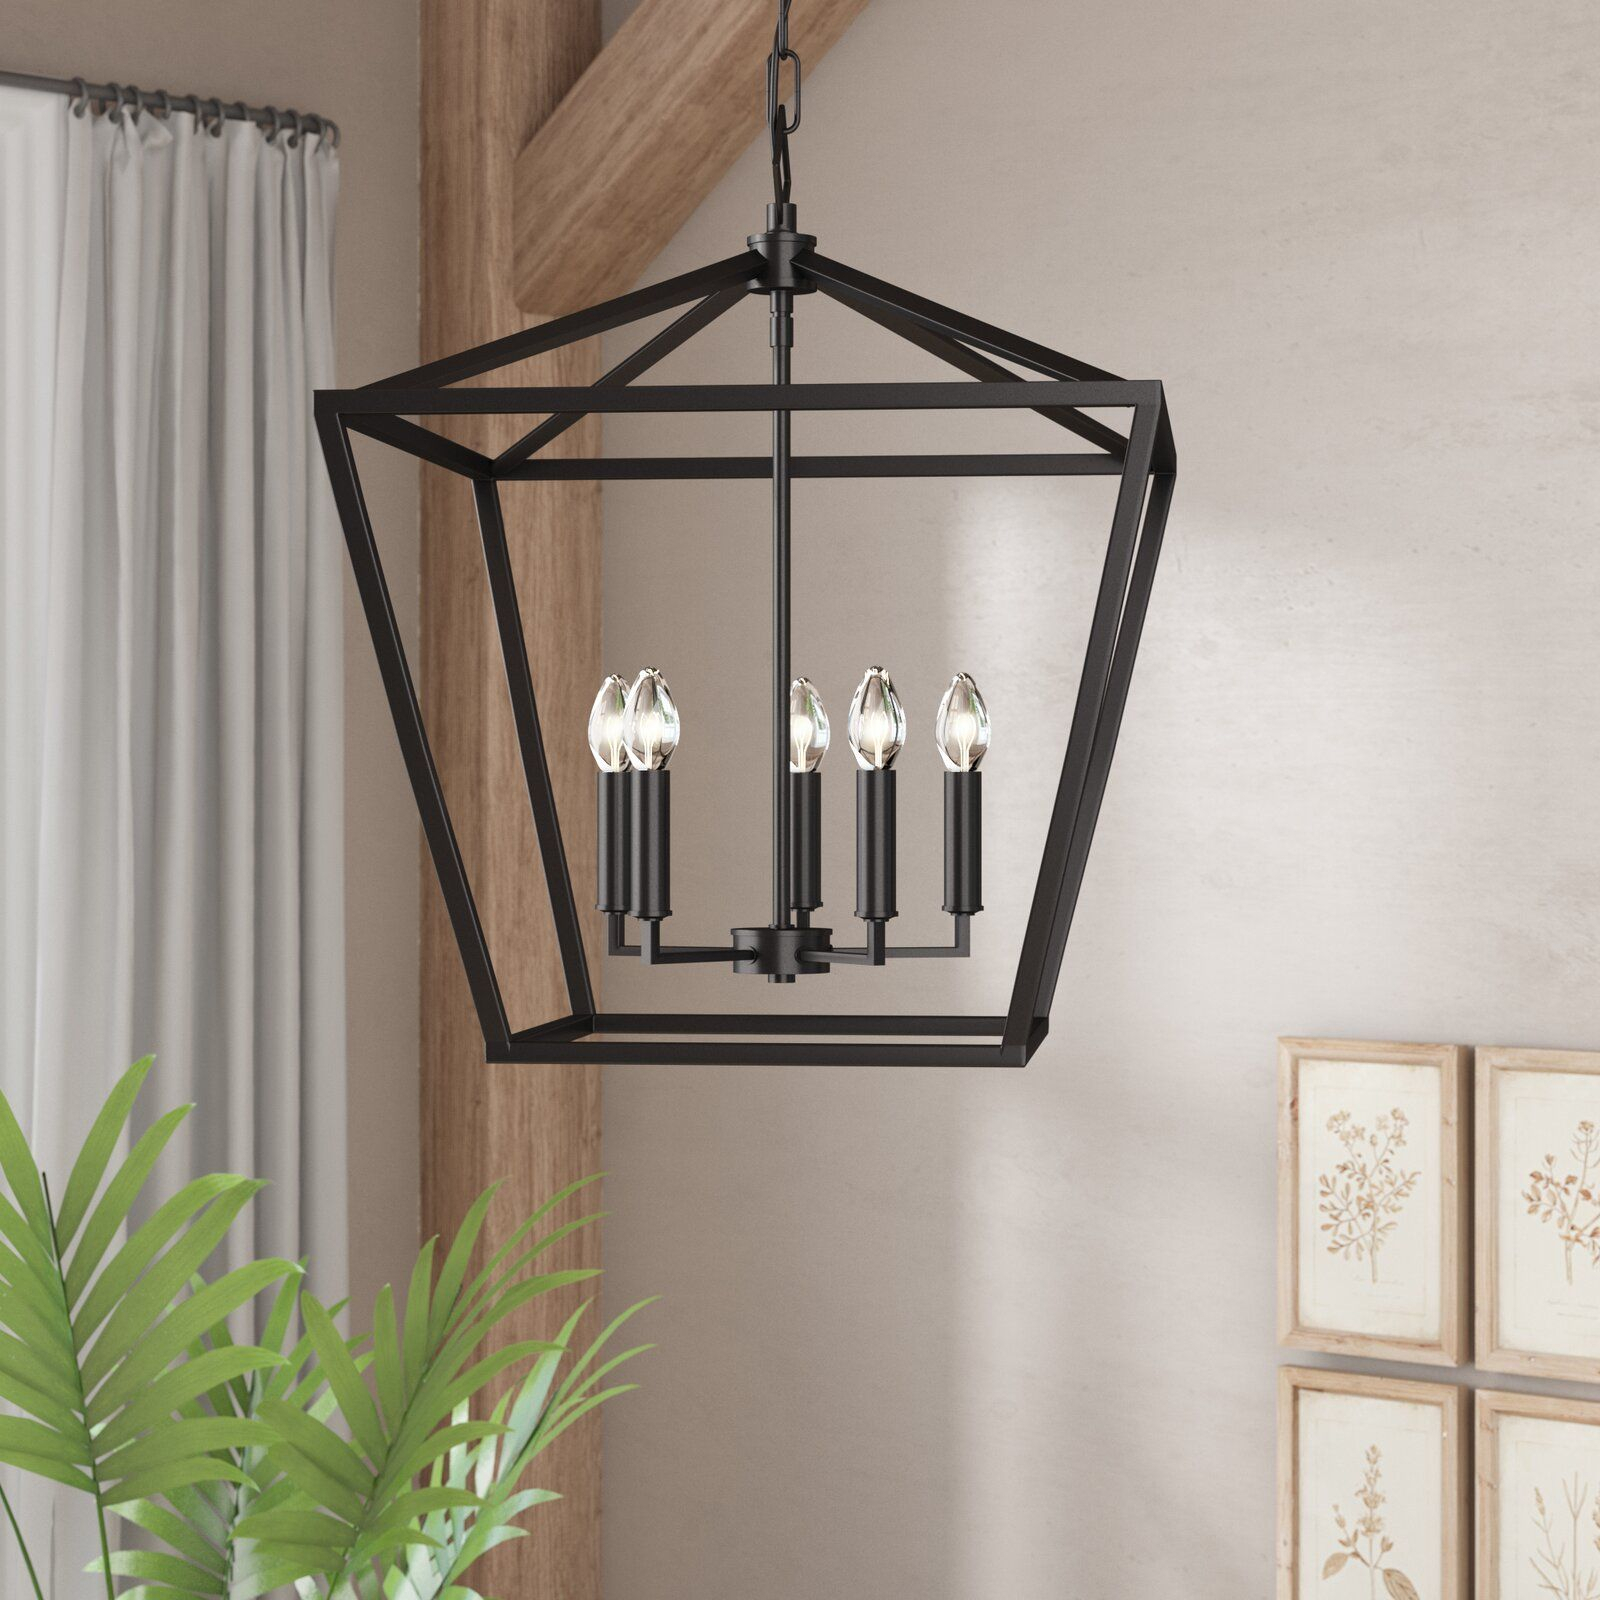 Poisson 4-Light Lantern Chandelier throughout Odie 8-Light Lantern Square / Rectangle Pendants (Image 25 of 30)